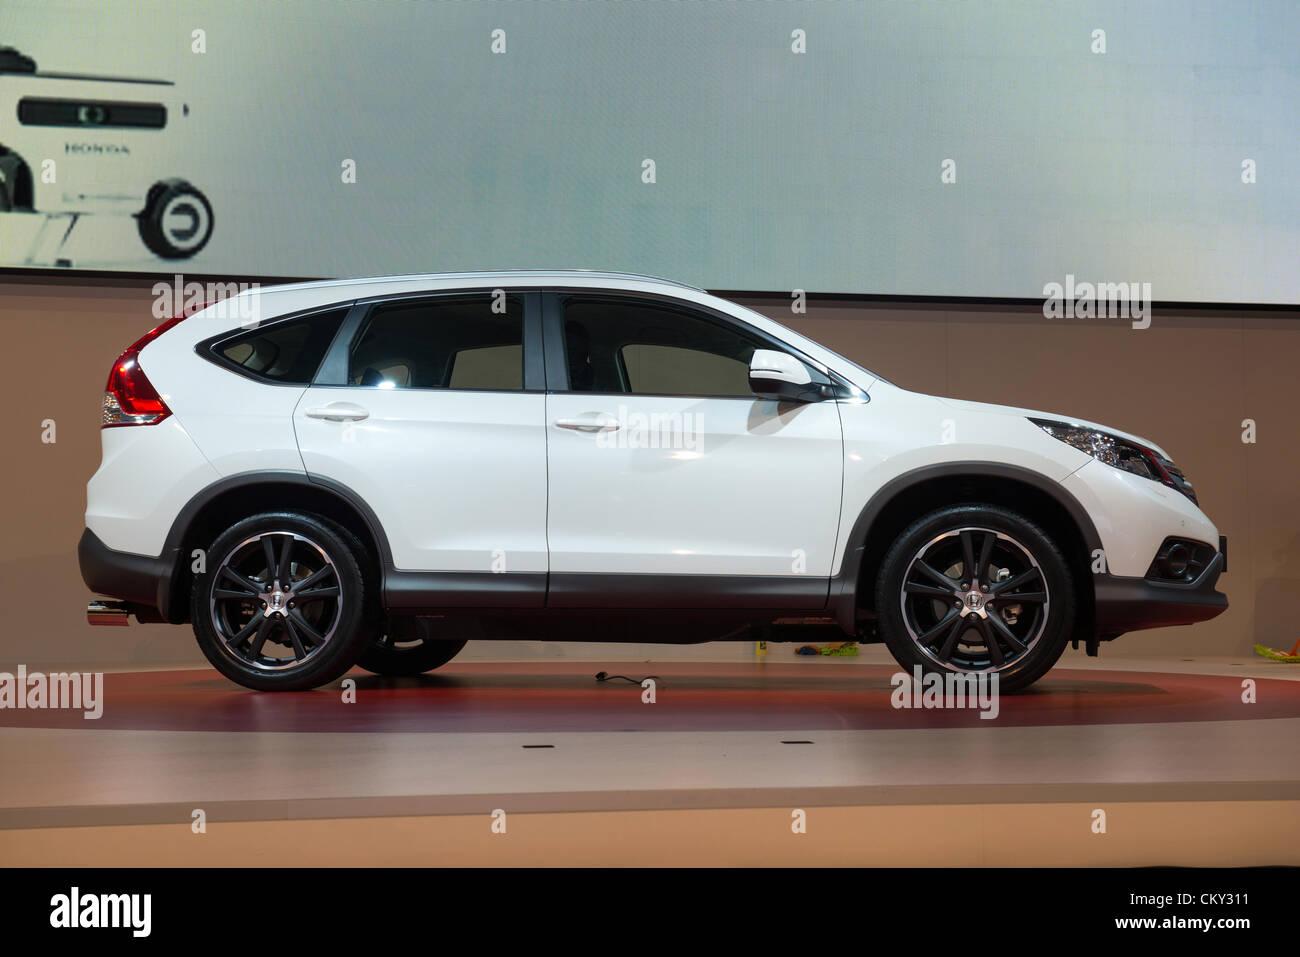 MOSCOW, RUSSIA - August 31: Moscow International Automobile Salon 2012. Honda CRV - Stock Image